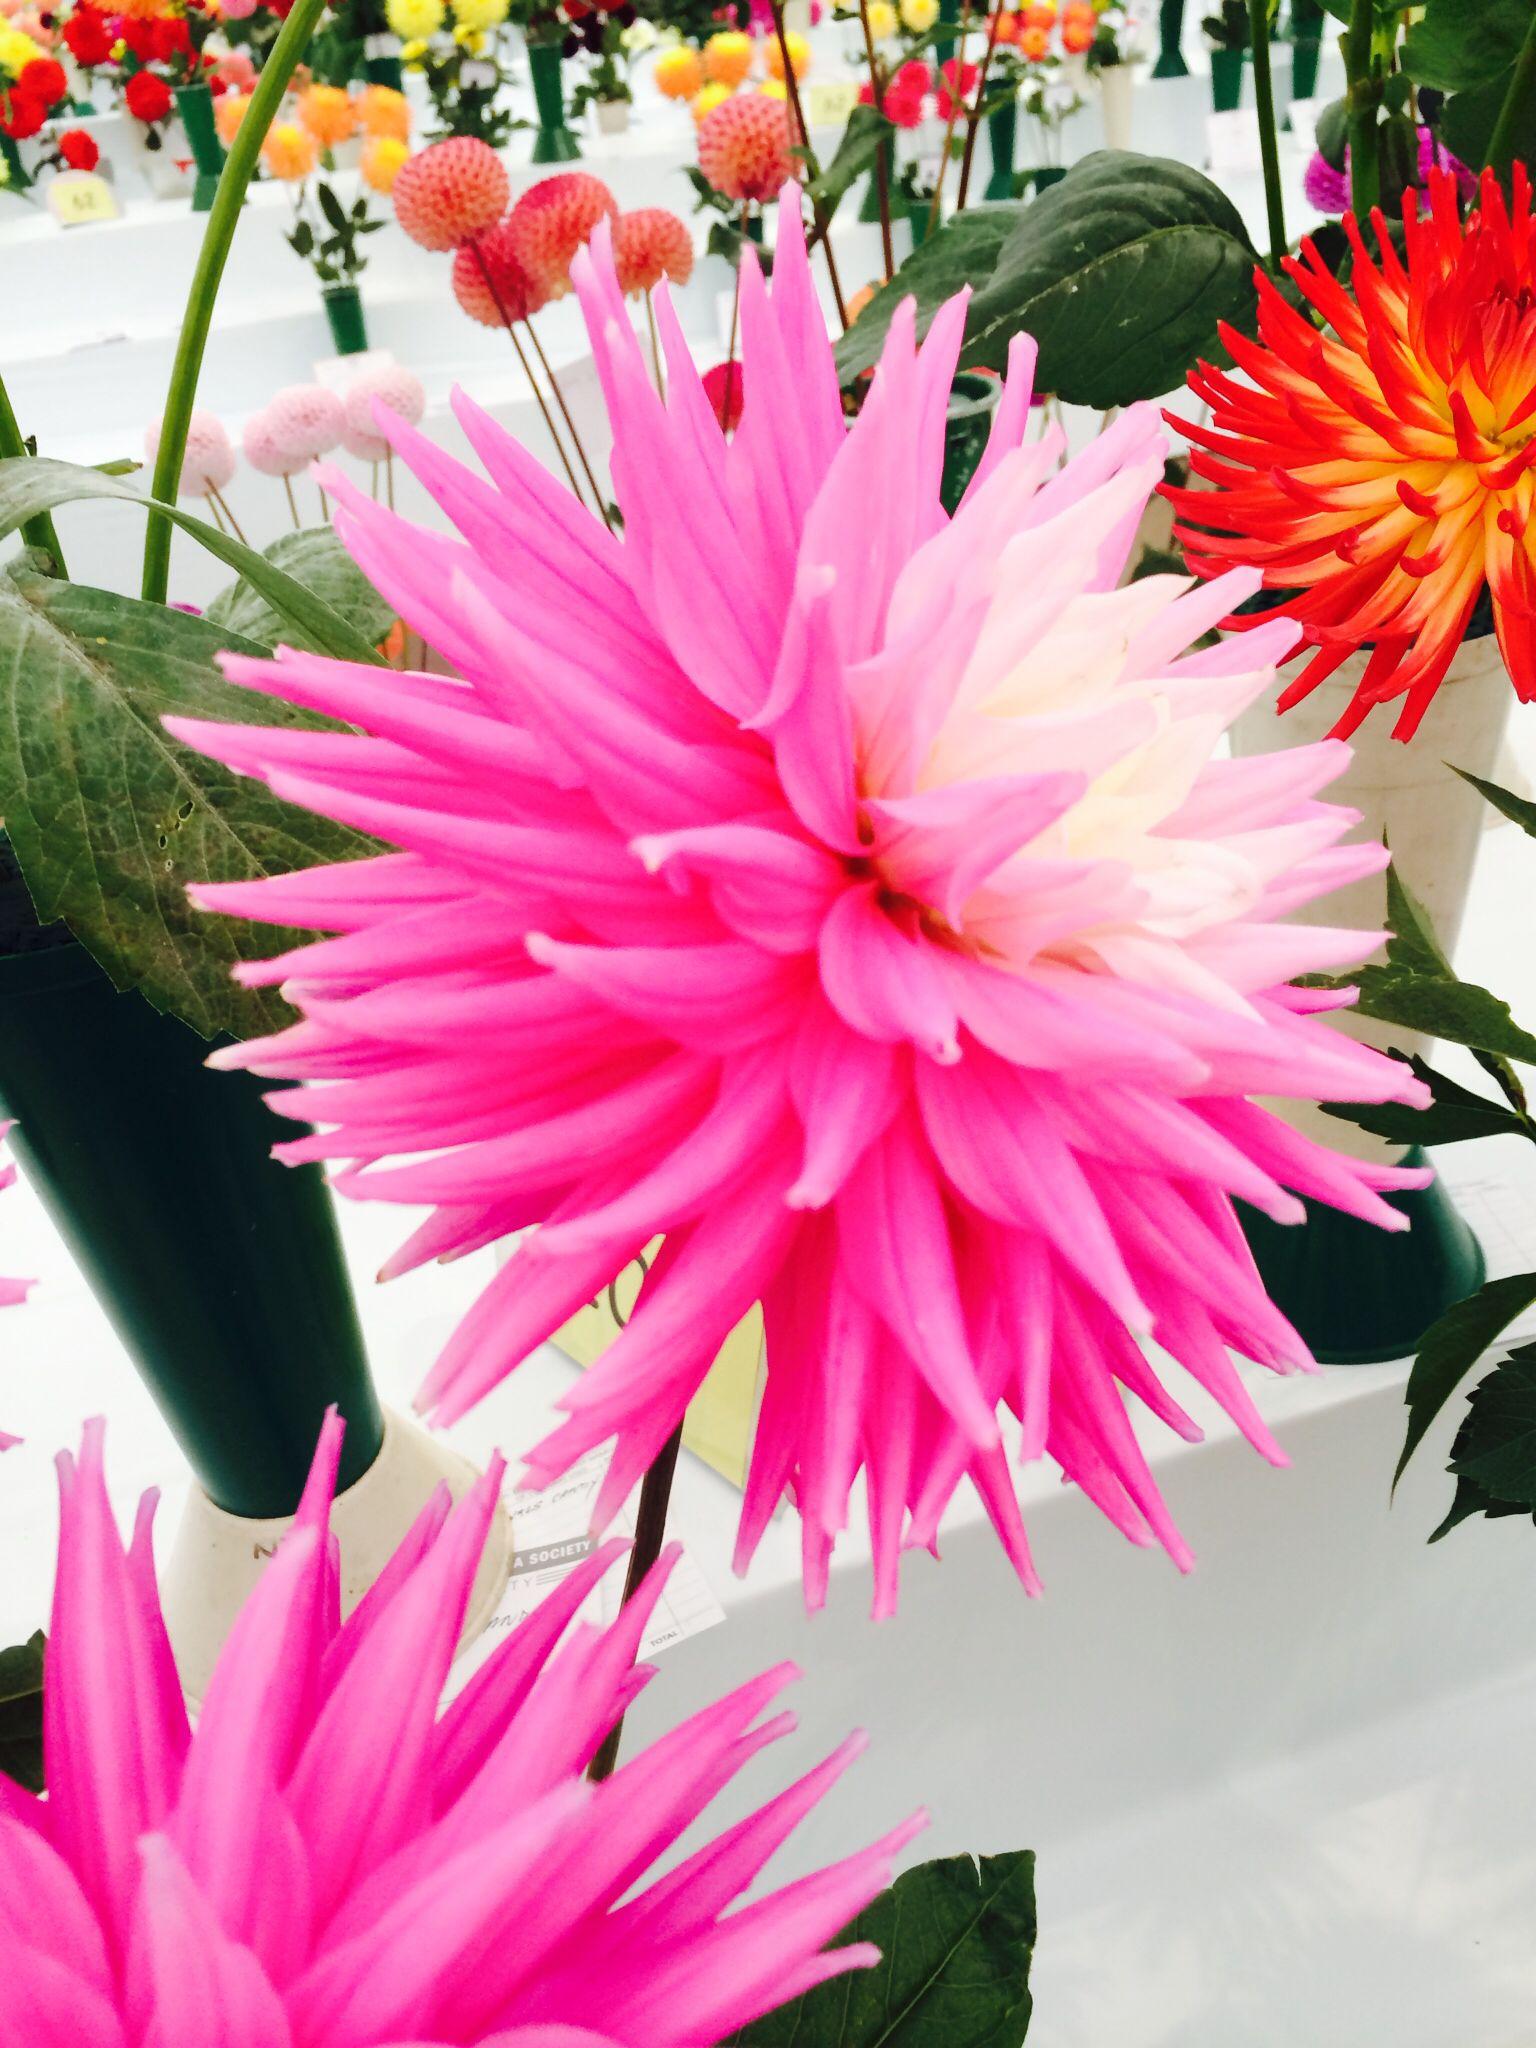 A Close Up Shot Of A Pink White Dahlia Harrogate Autumn Flower